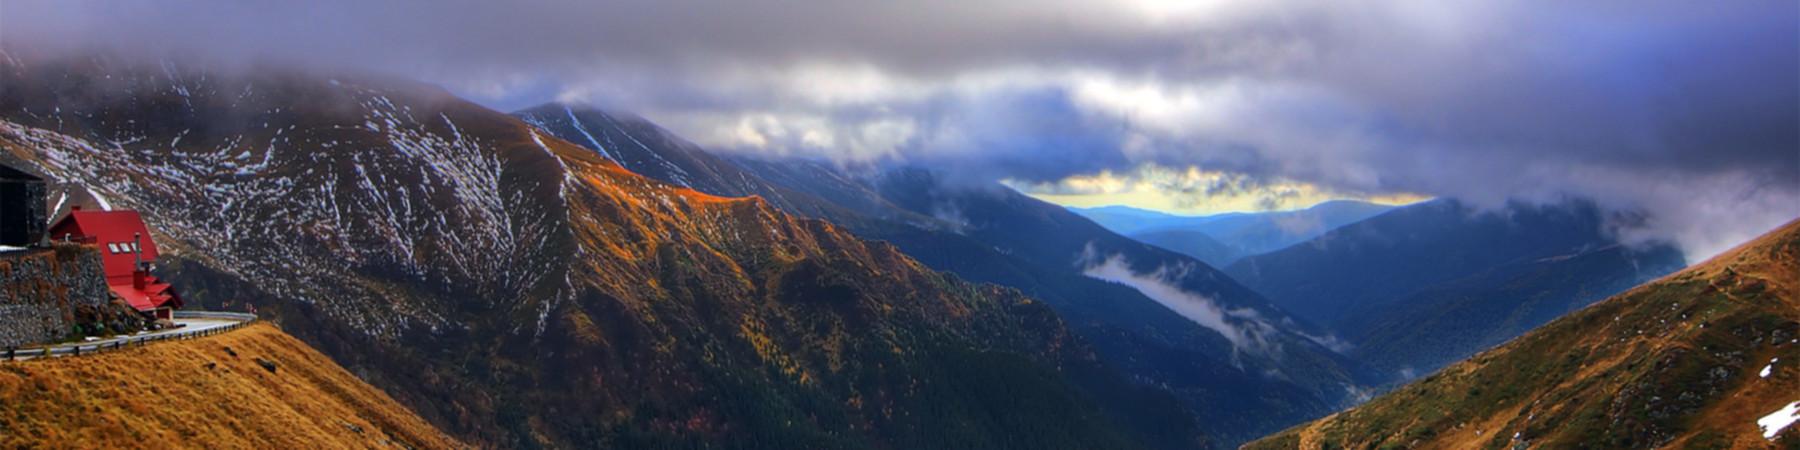 Carpathian_Mountains_Banner.jpg